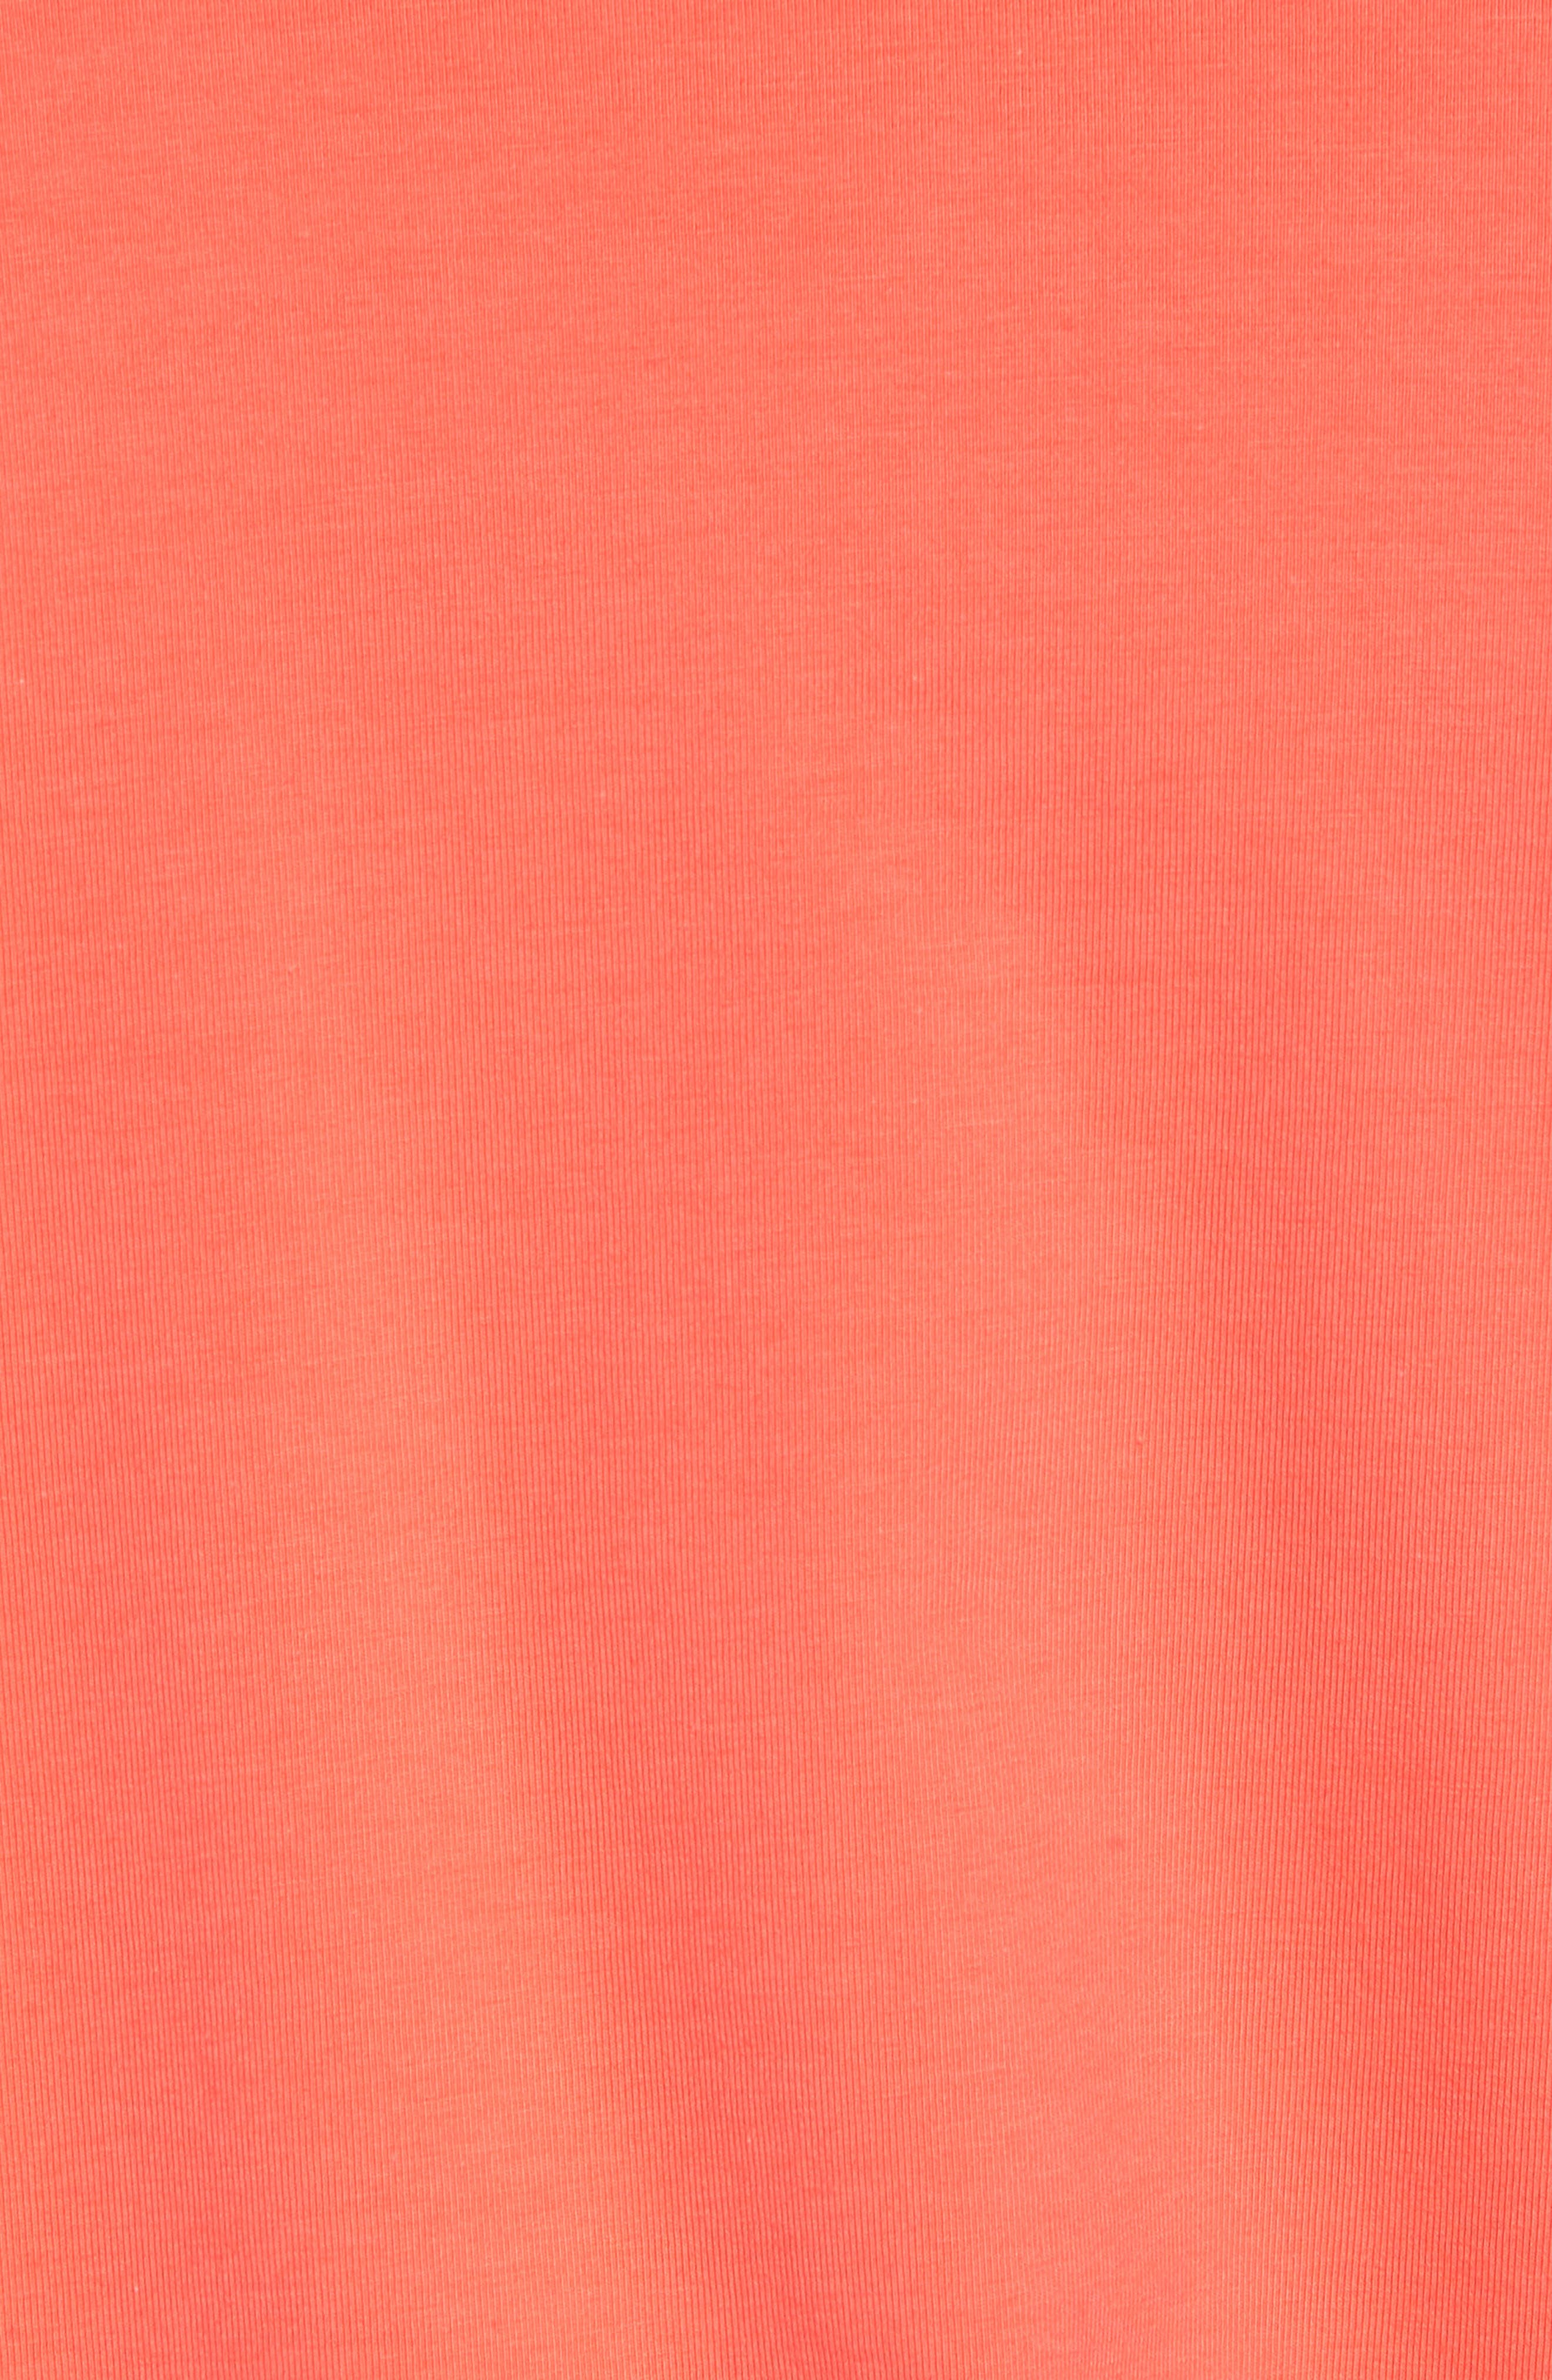 ,                             PTO Liquid Stretch Quarter Zip Pullover,                             Alternate thumbnail 29, color,                             673